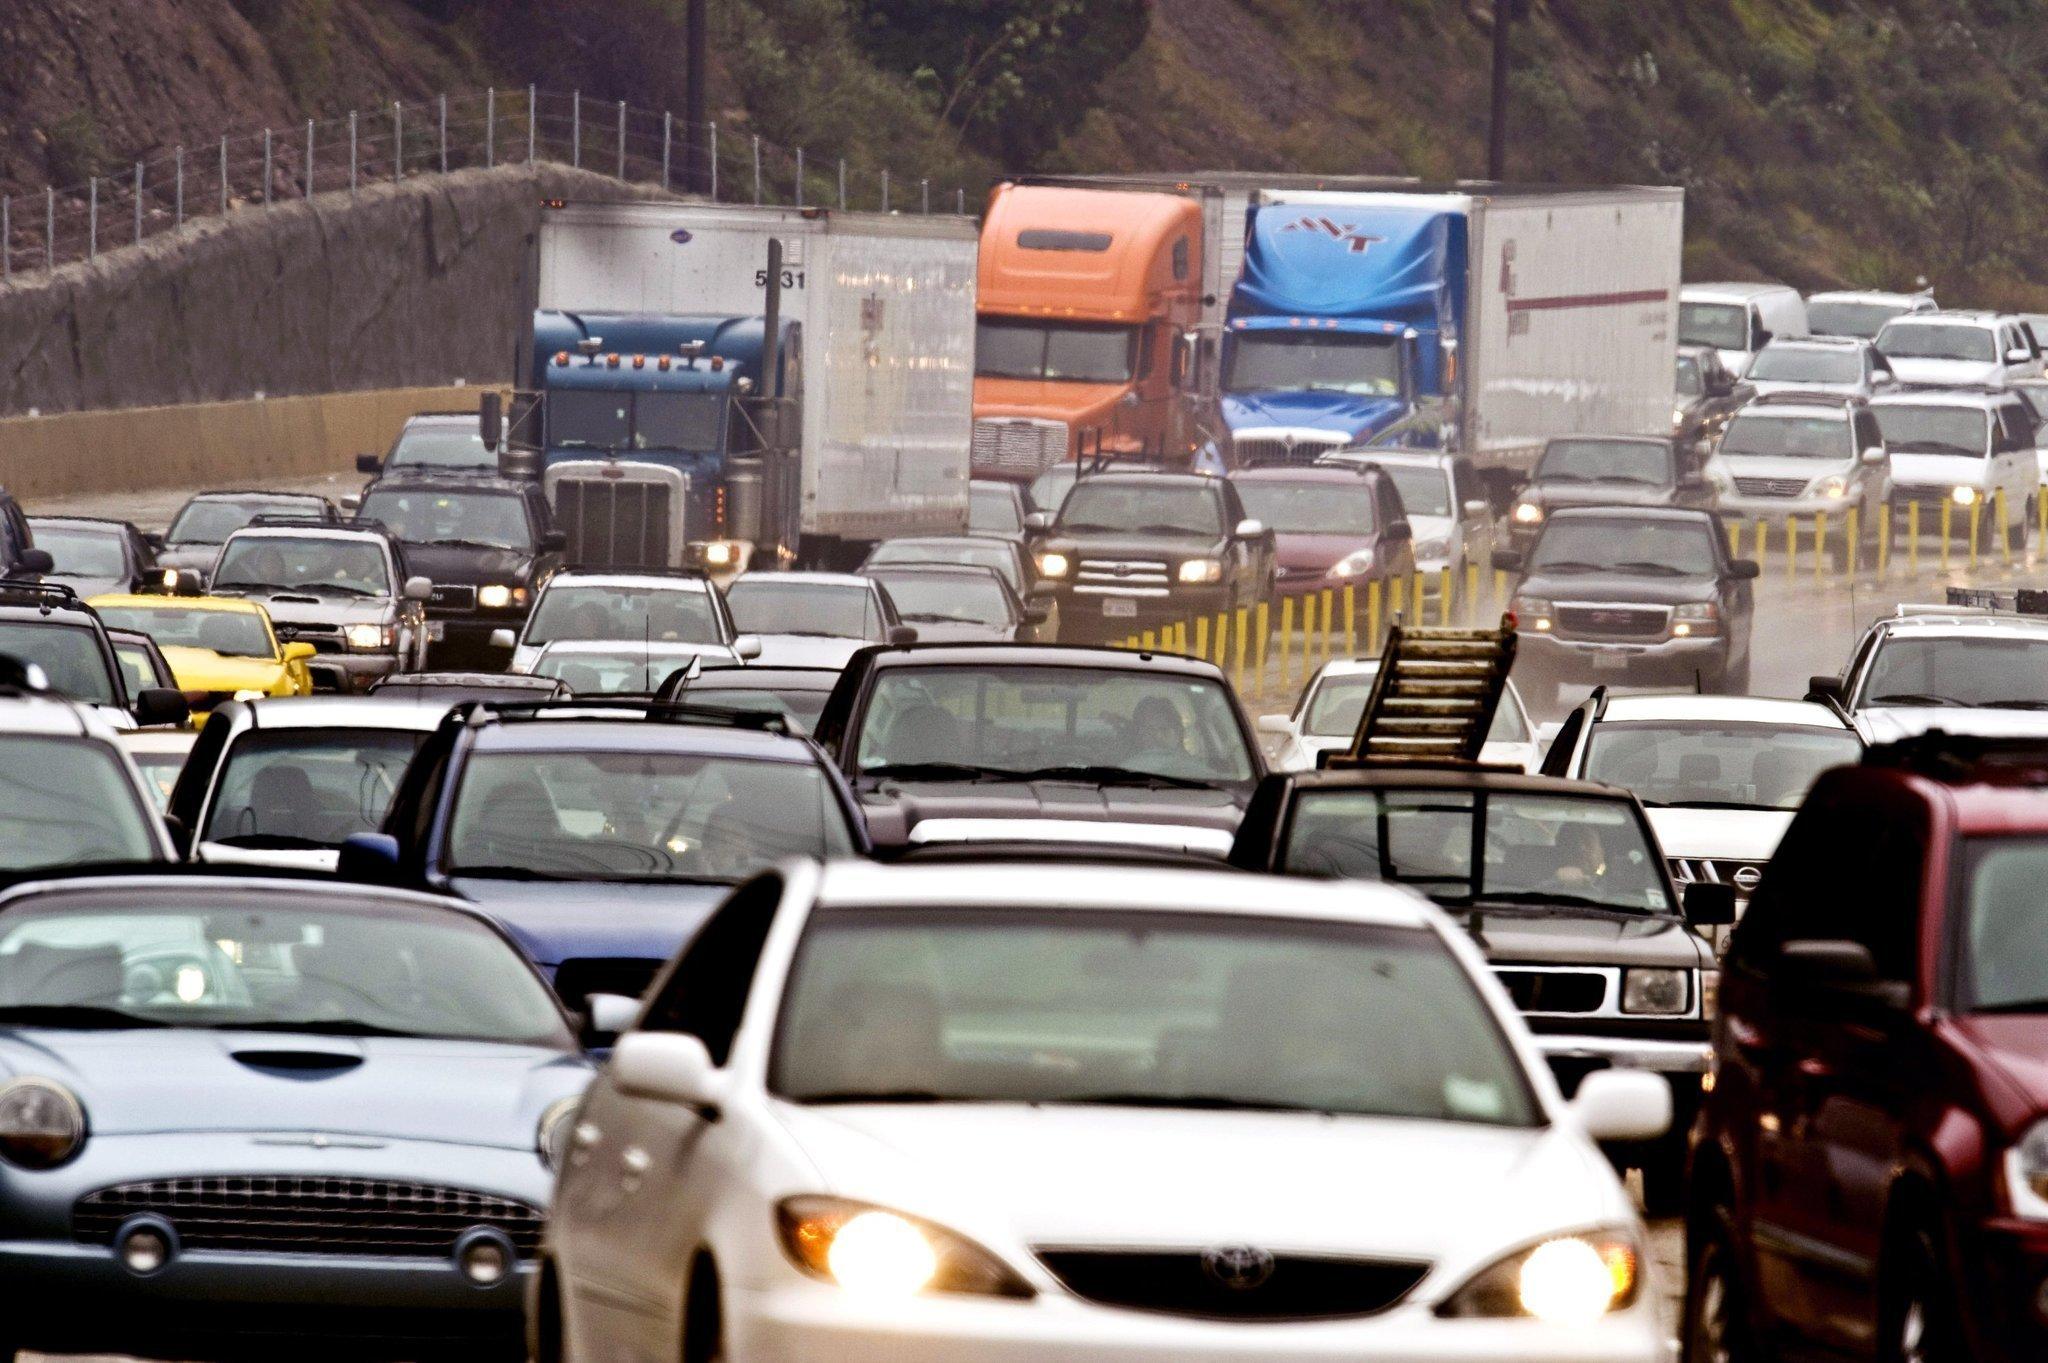 Coronageddon' closes Riverside County freeway for weekend